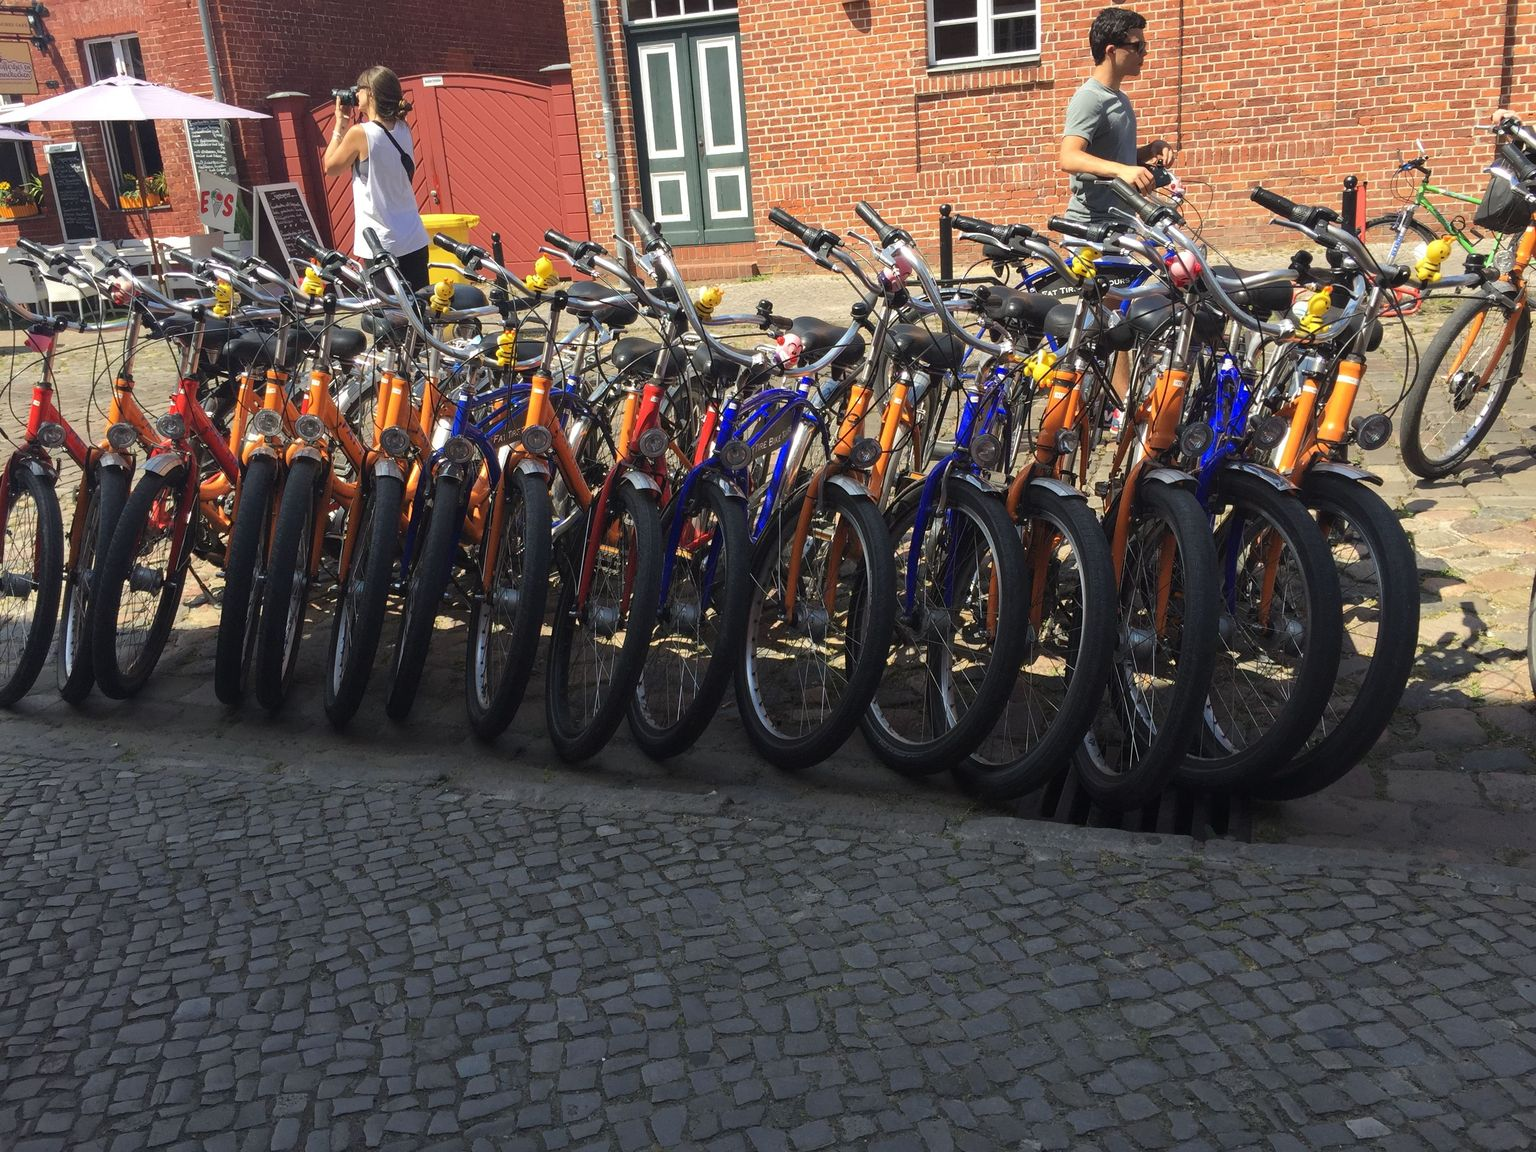 MORE PHOTOS, Berlin Bike Tour